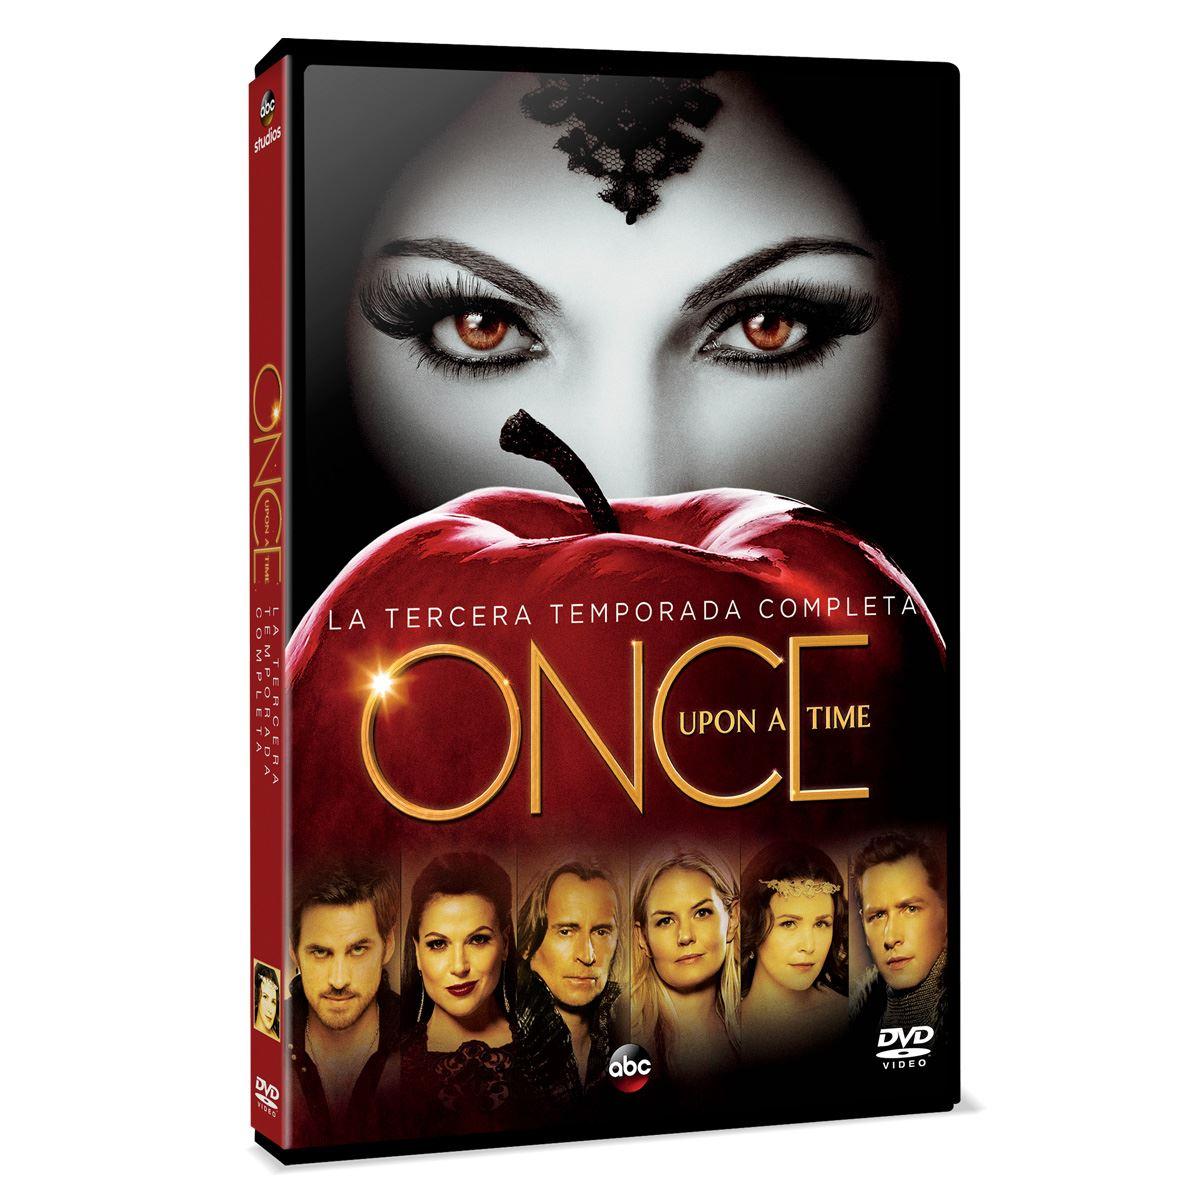 DVD Once Upon a Time: La tercera temporada completa